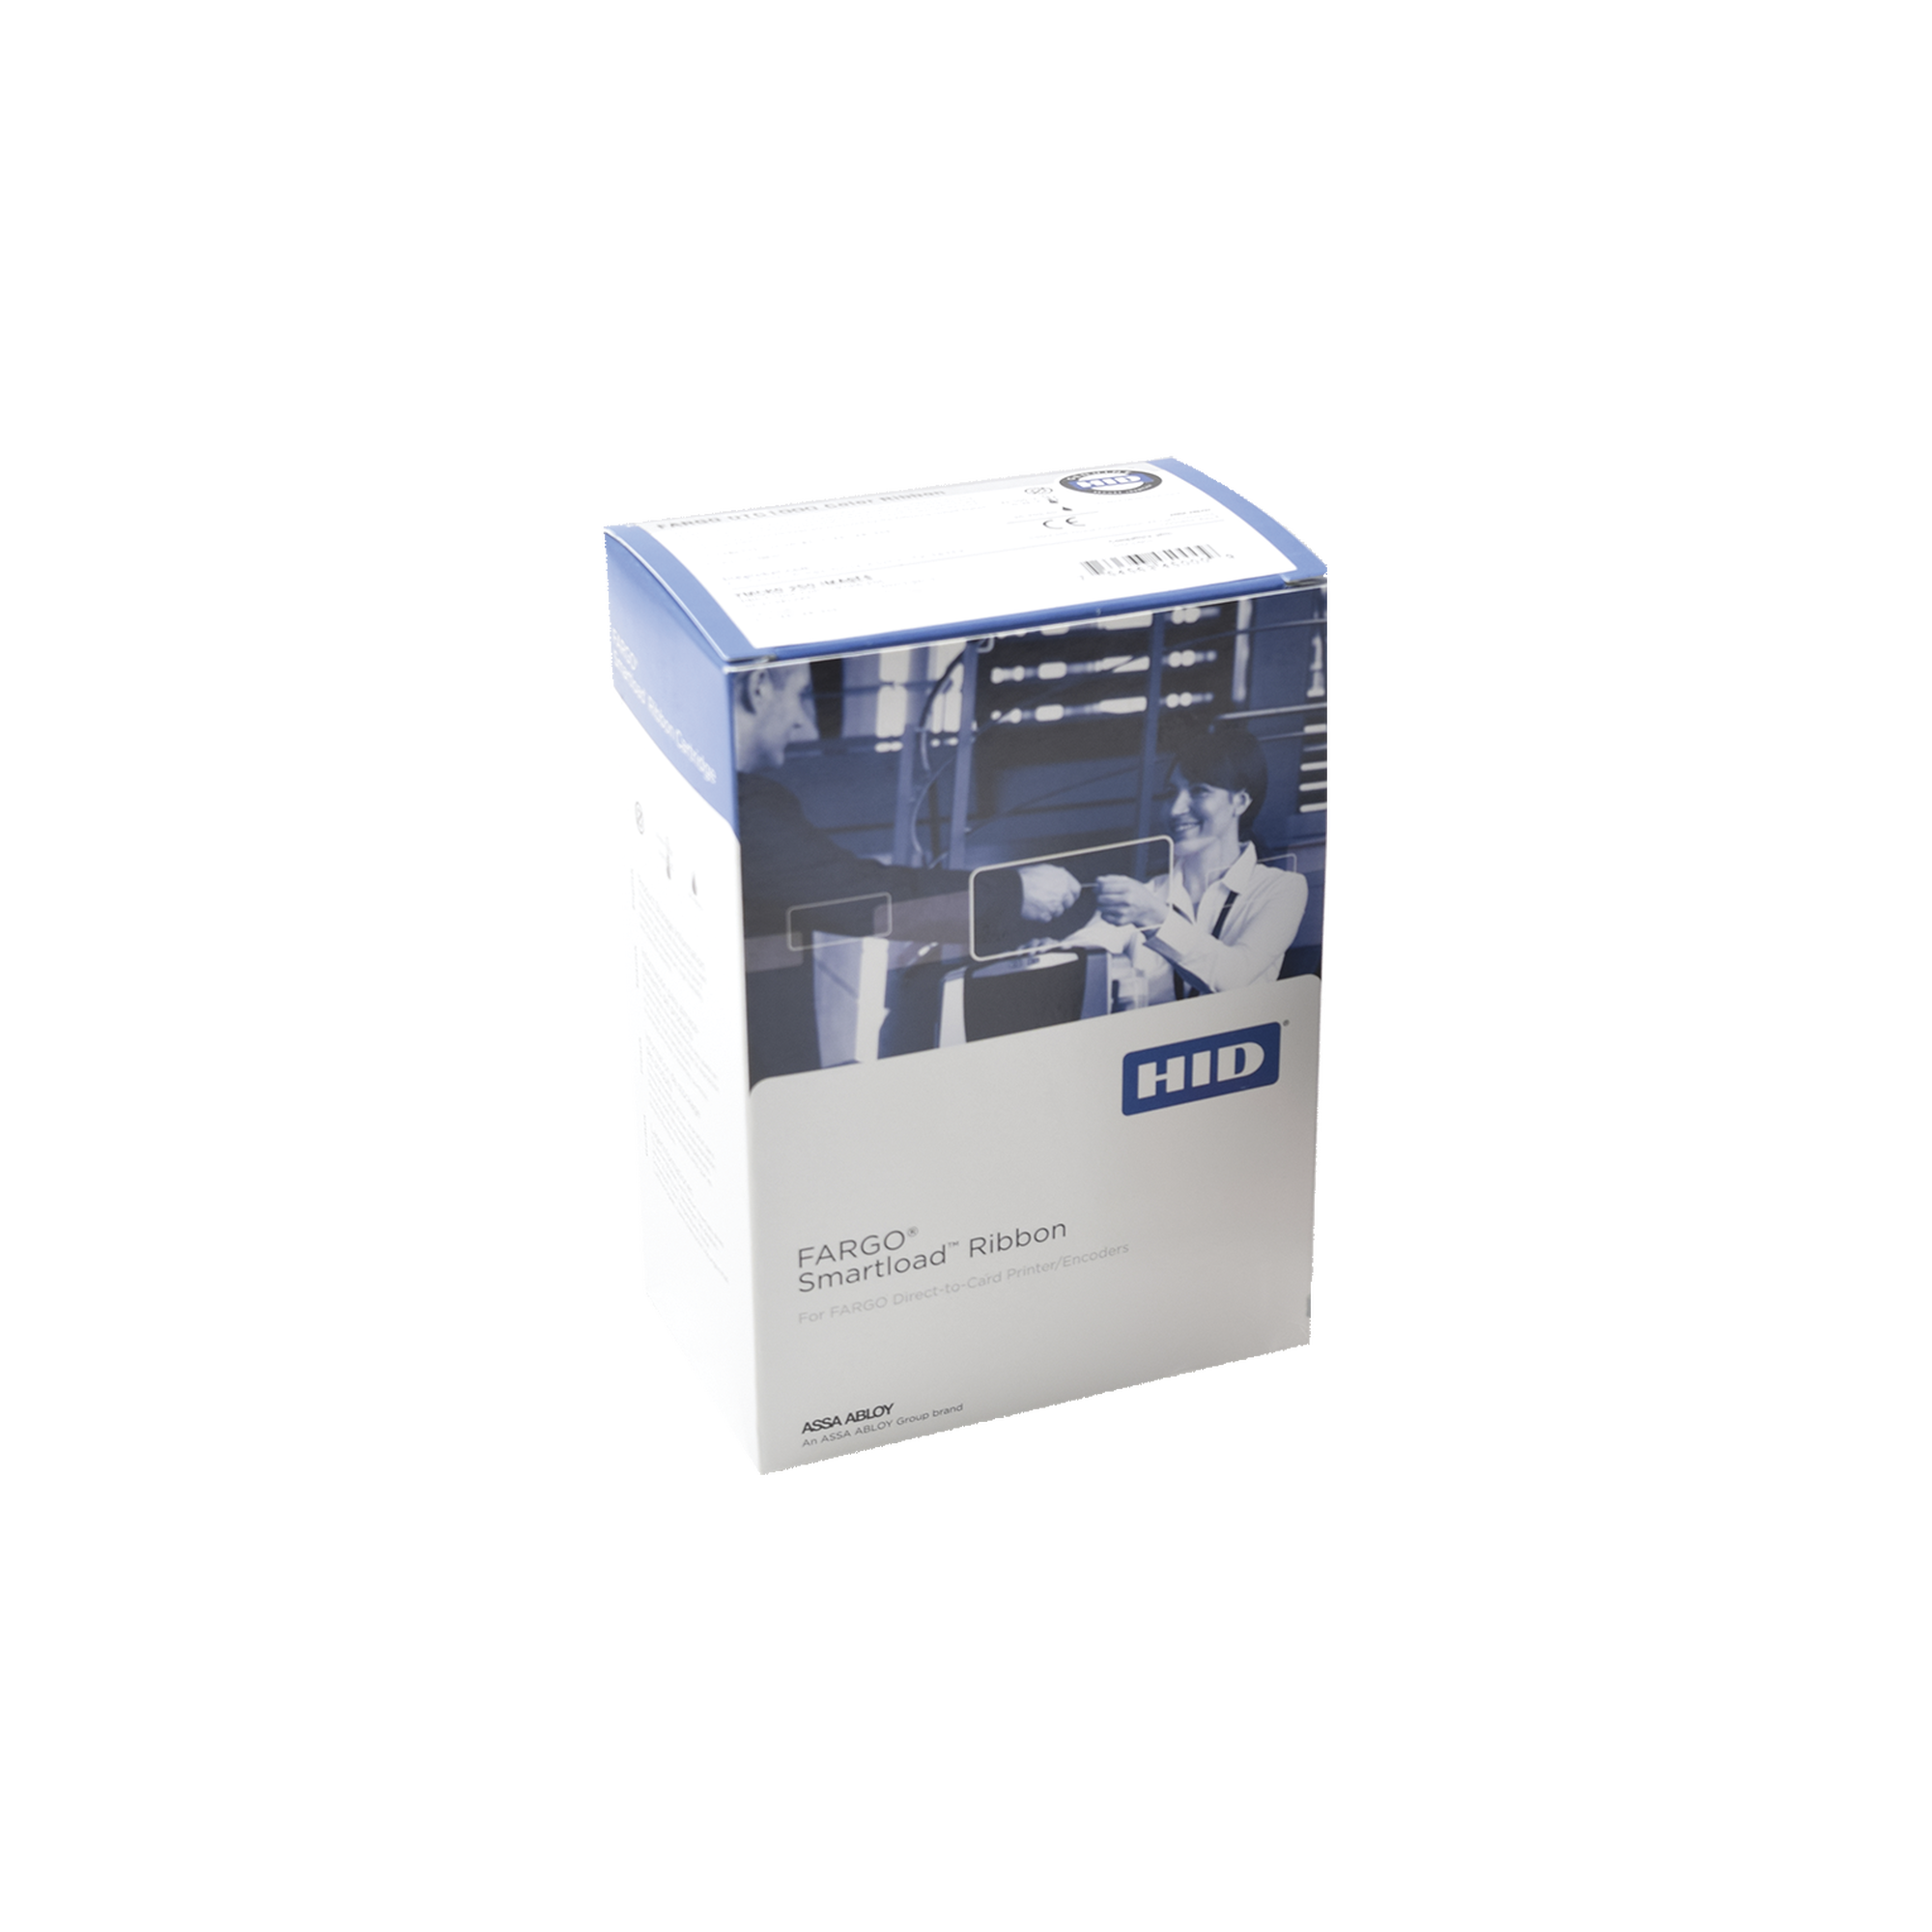 Ribbon YMCKK Full color con 2 paneles de resina negro / Para DTC4500, DTC4500e / de 500 impresiones